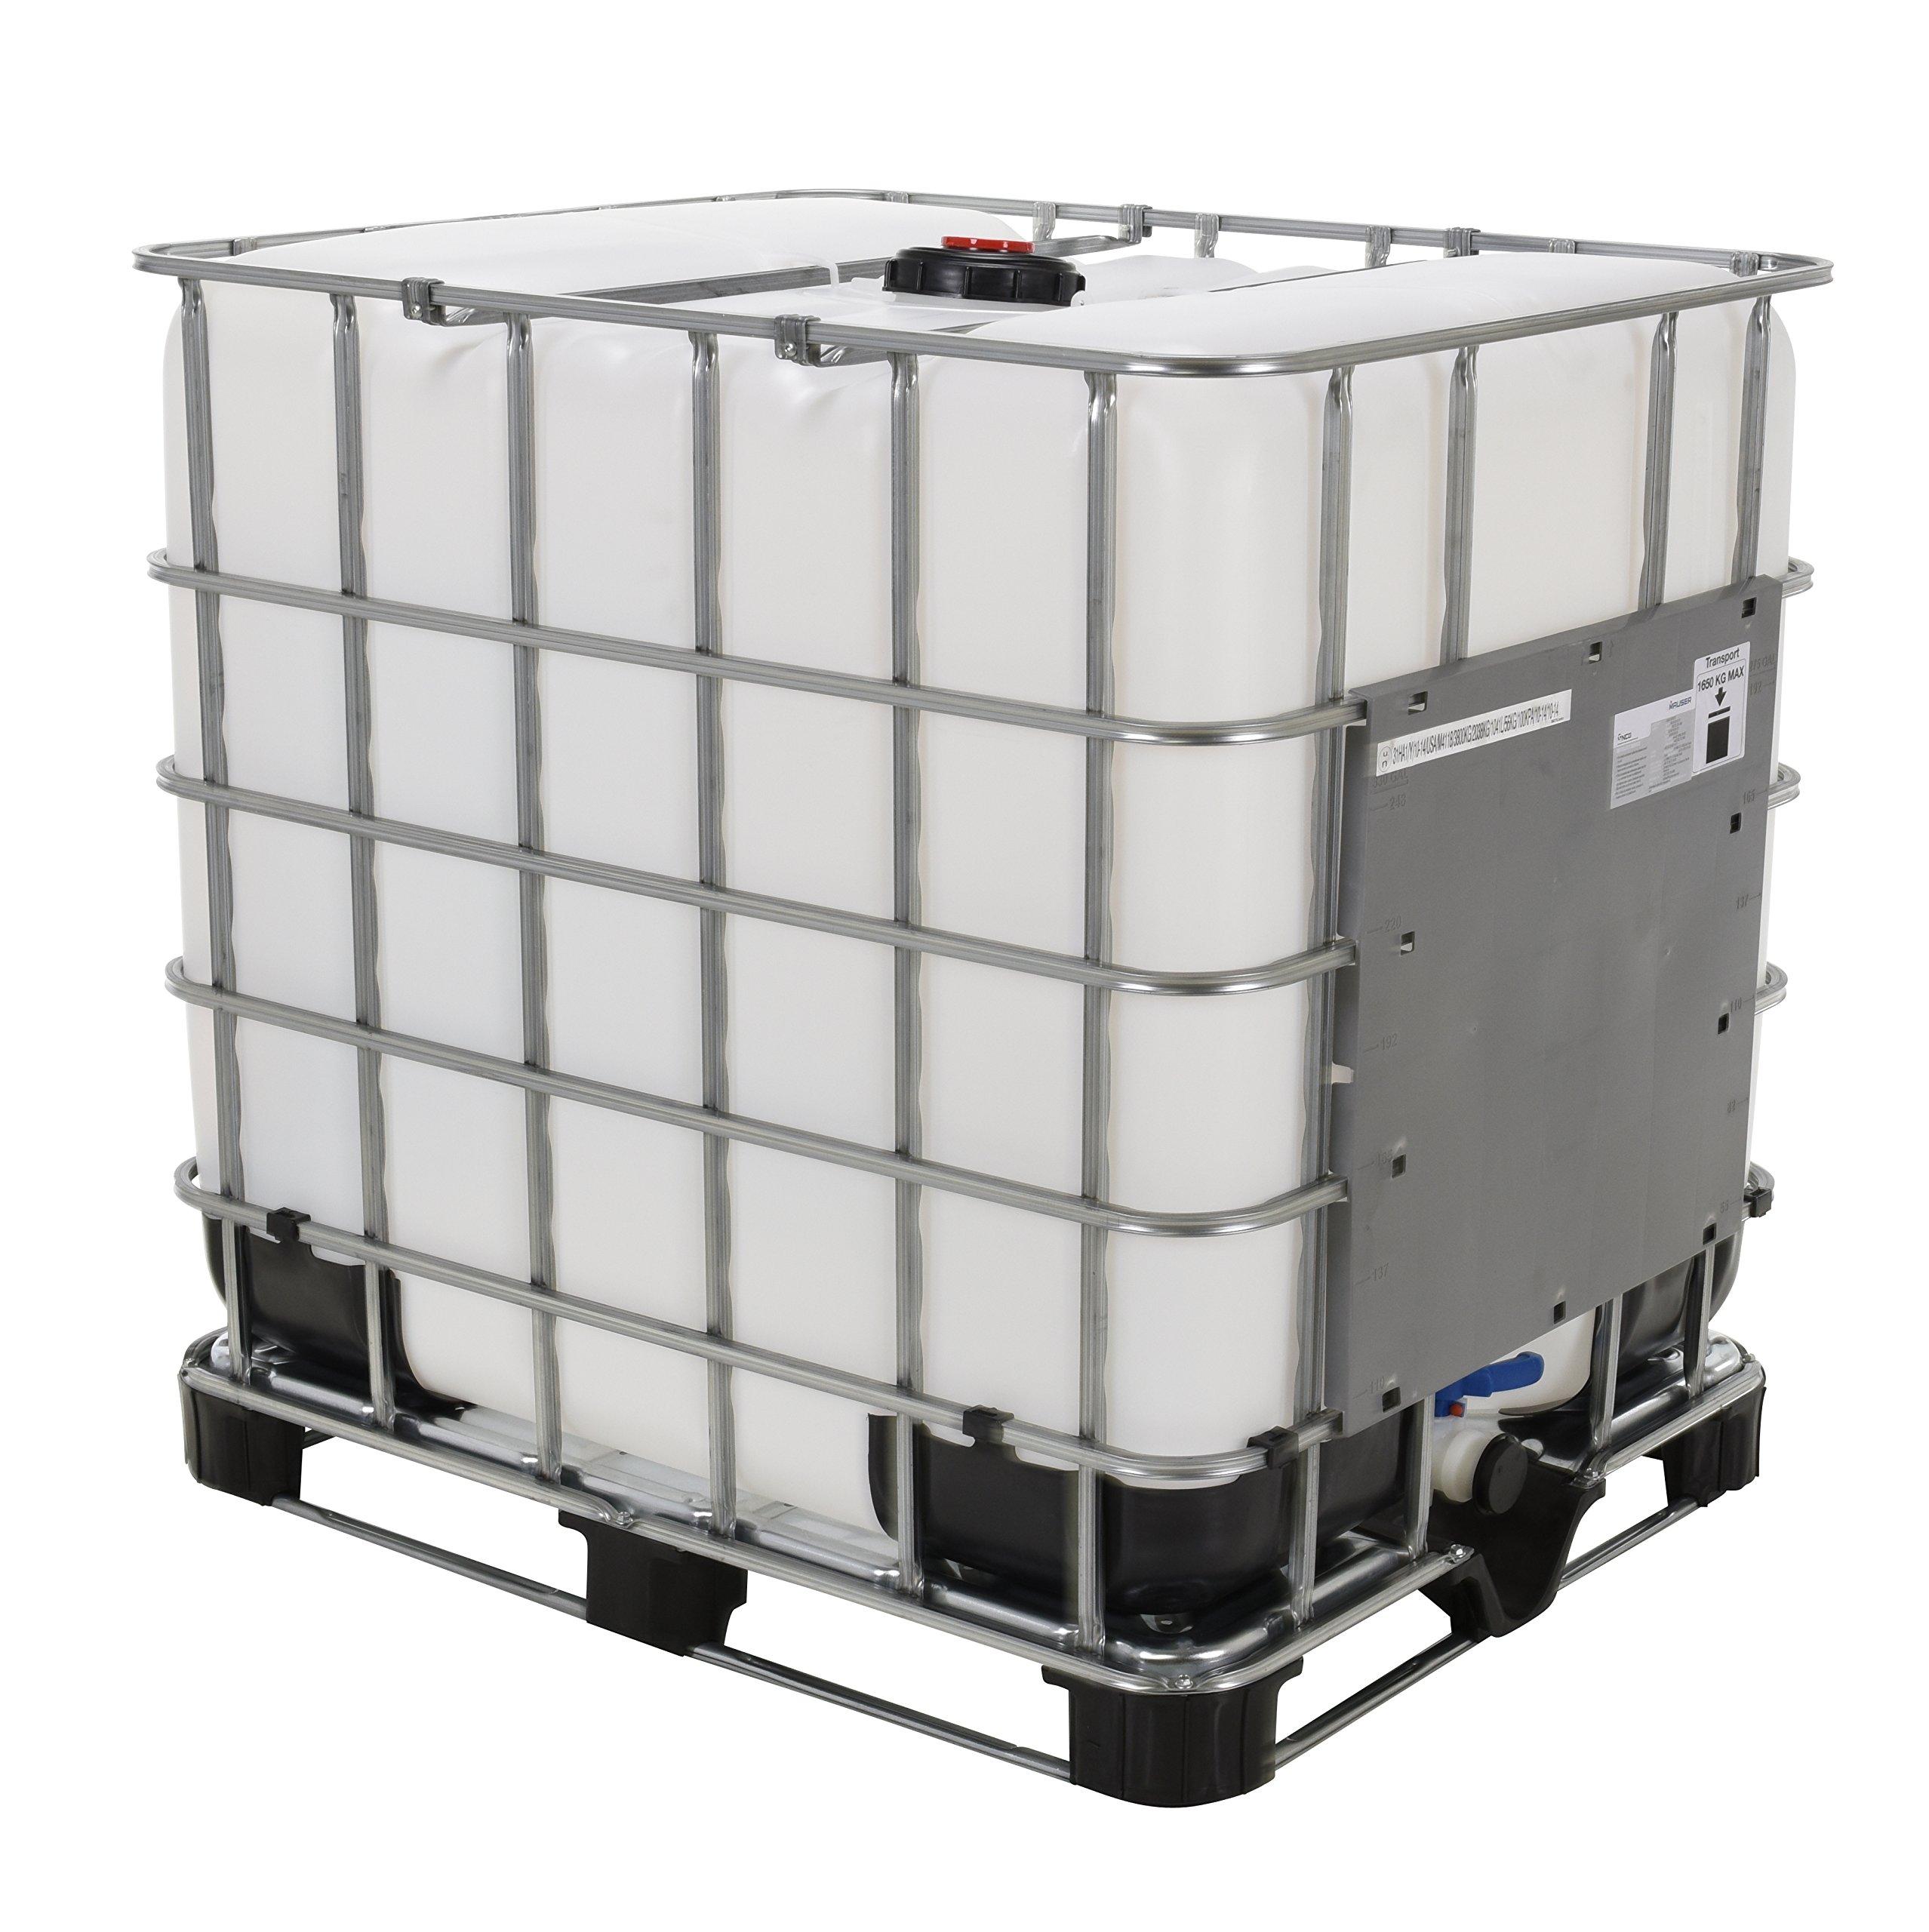 Vestil IBC-275 Steel Intermediate Bulk Crate, 275 Gallon Capacity, 47 Length x 45'' Width x 39'' Height